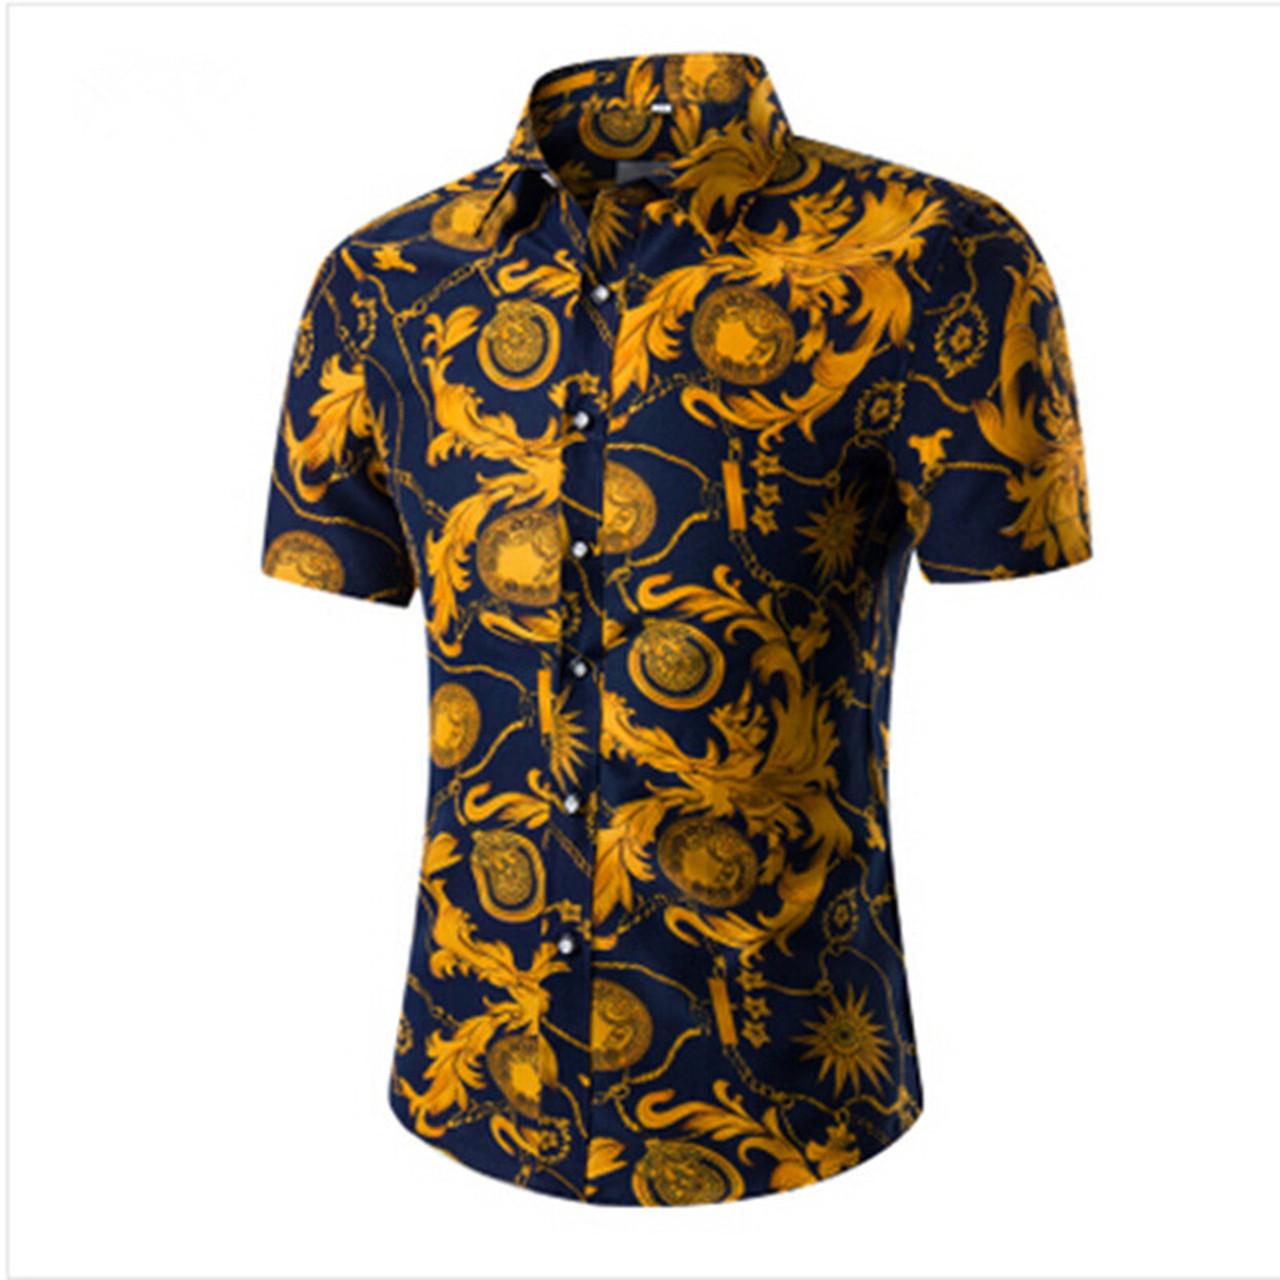 26d527ca953d 2018 Fashion Mens Short Sleeve Hawaiian Shirt Summer Casual Floral Shirts  For Men Asian Size M ...